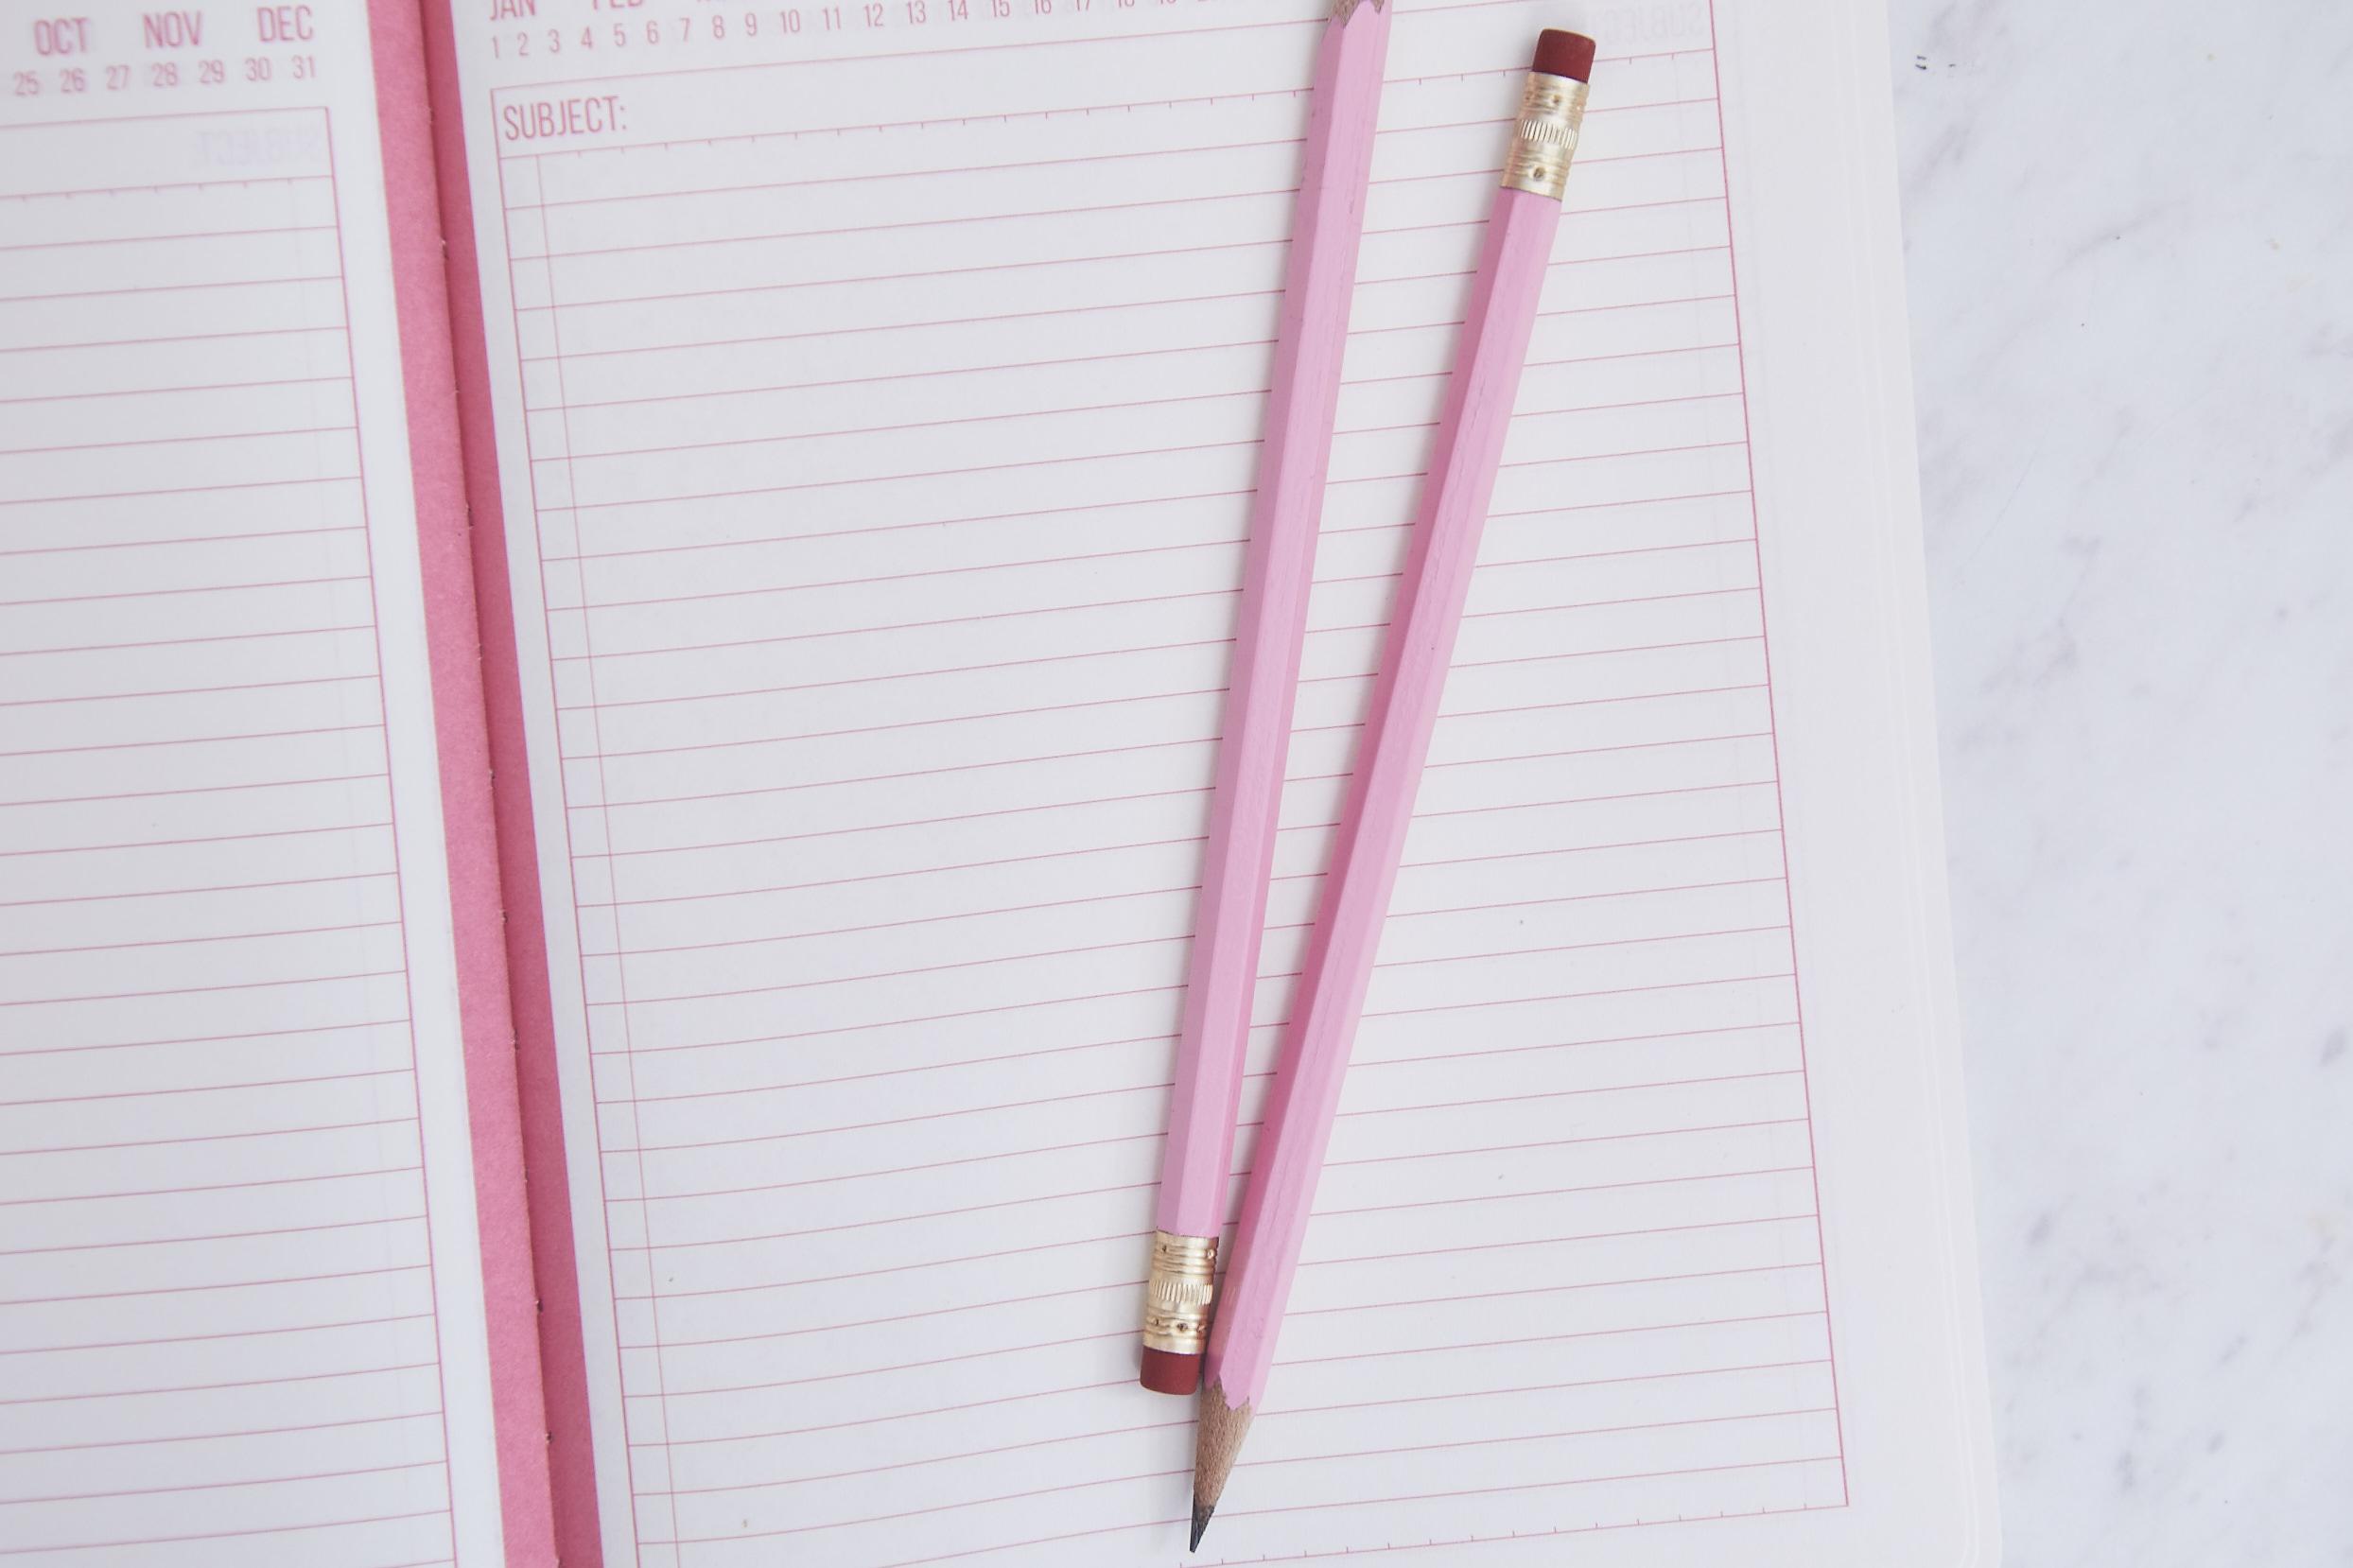 Musgrave Pencil0532.jpg